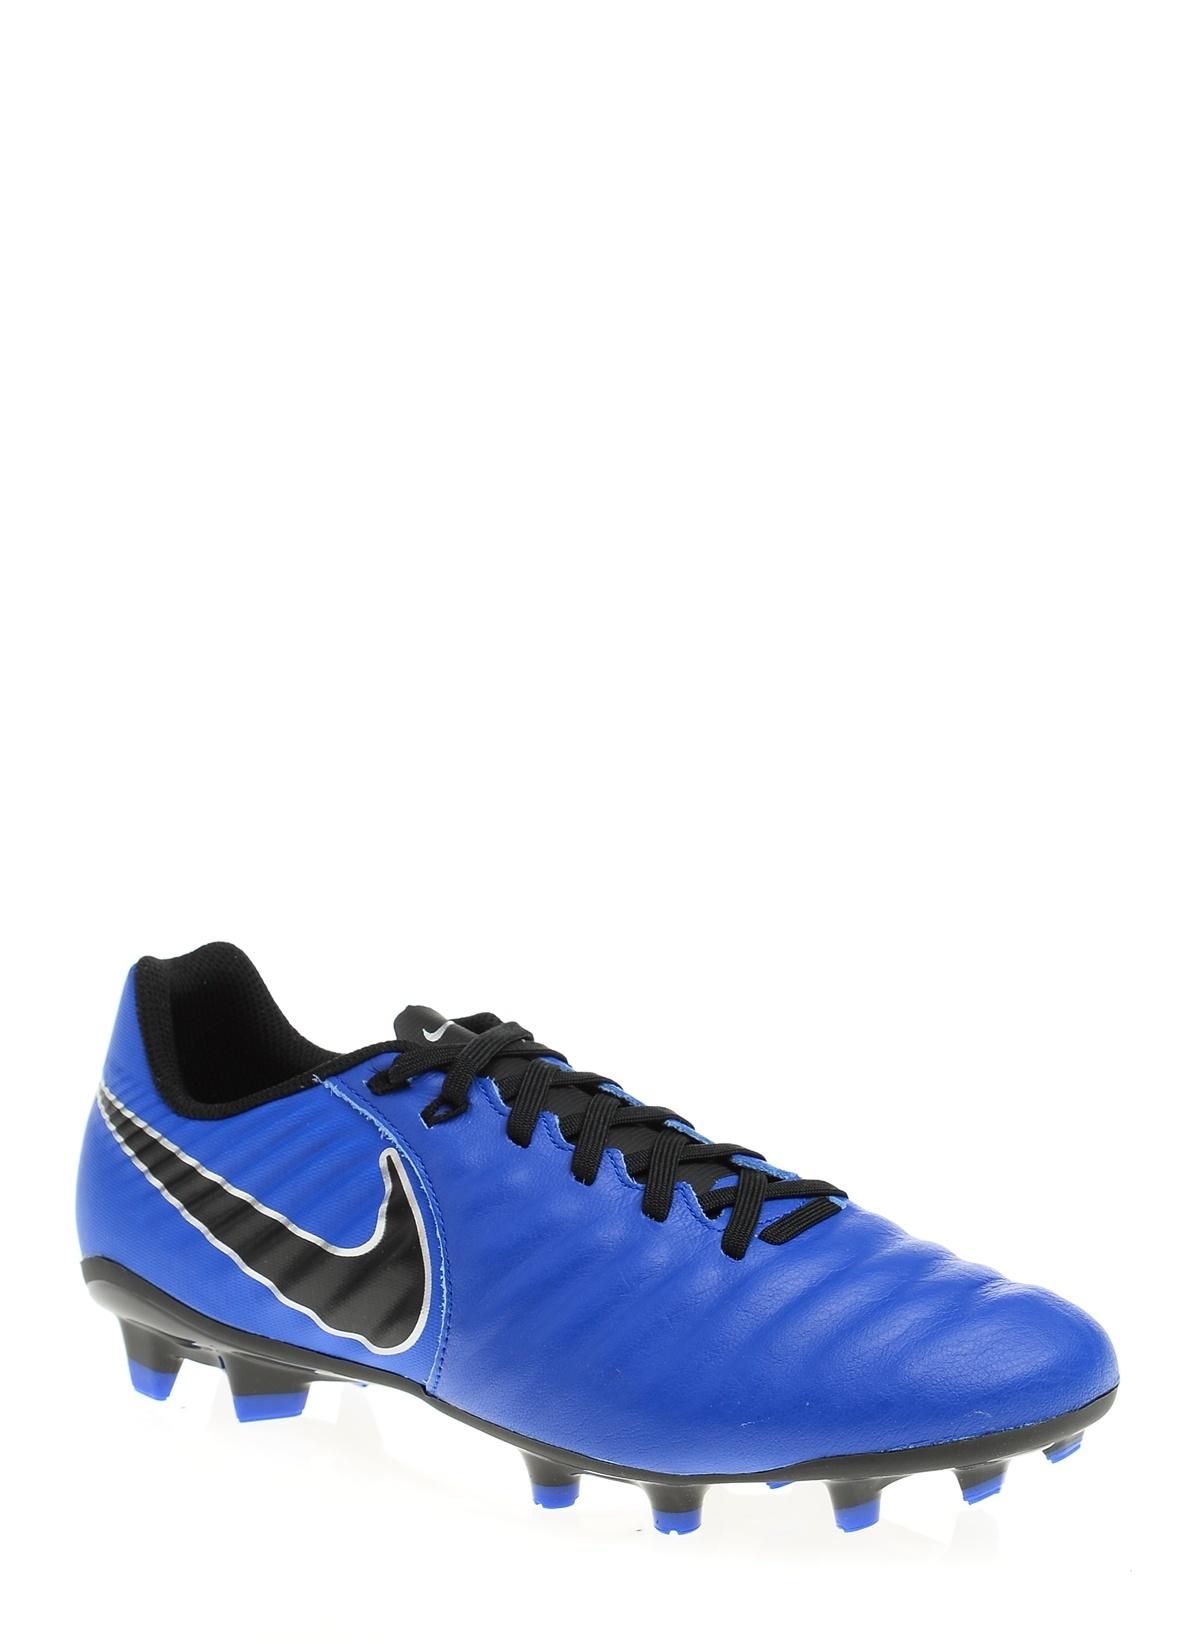 22f312a525b Nike Erkek Legend 7 Academy Fg Racer Blue Black-Metallic Silv ...